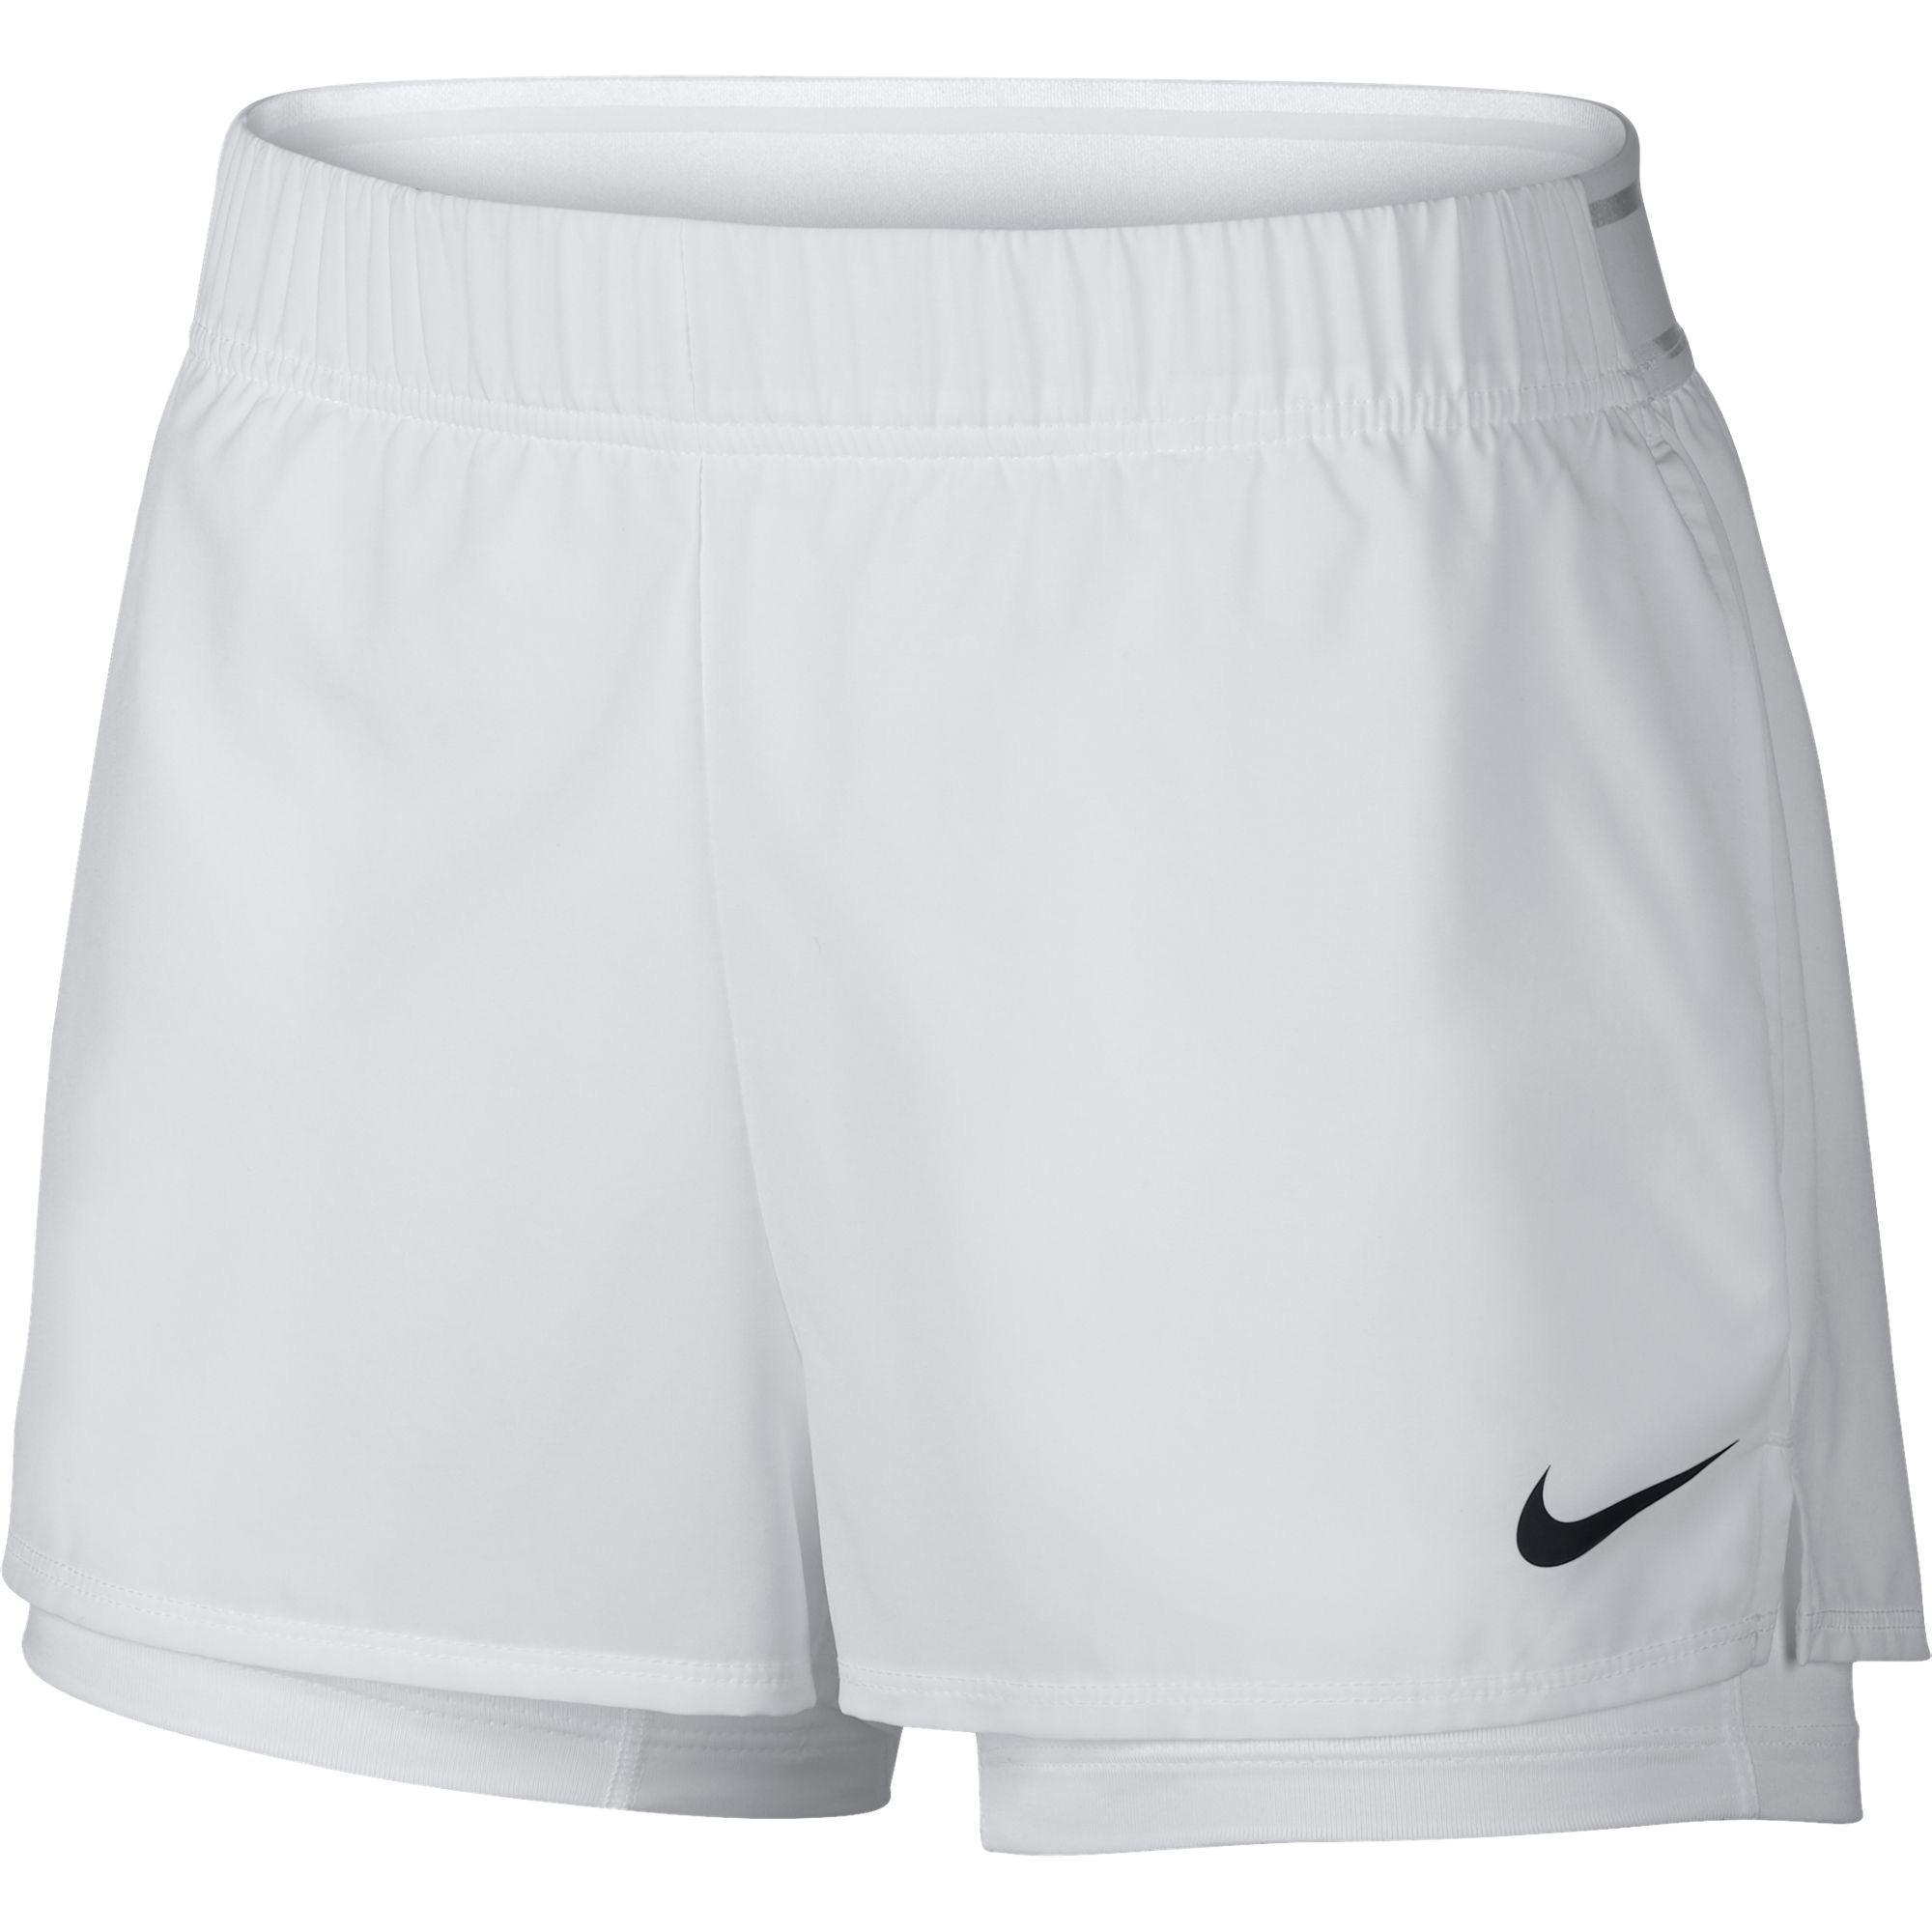 nike shorts tennis